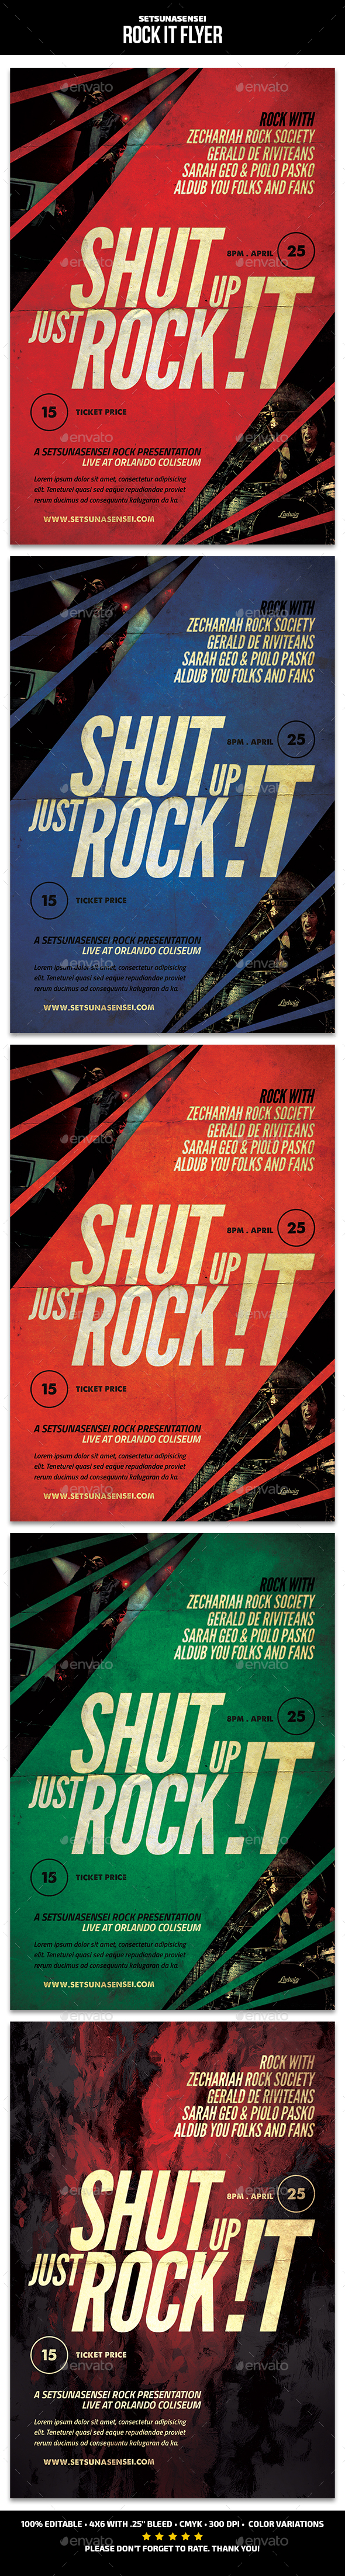 Rock It Flyer - Concerts Events